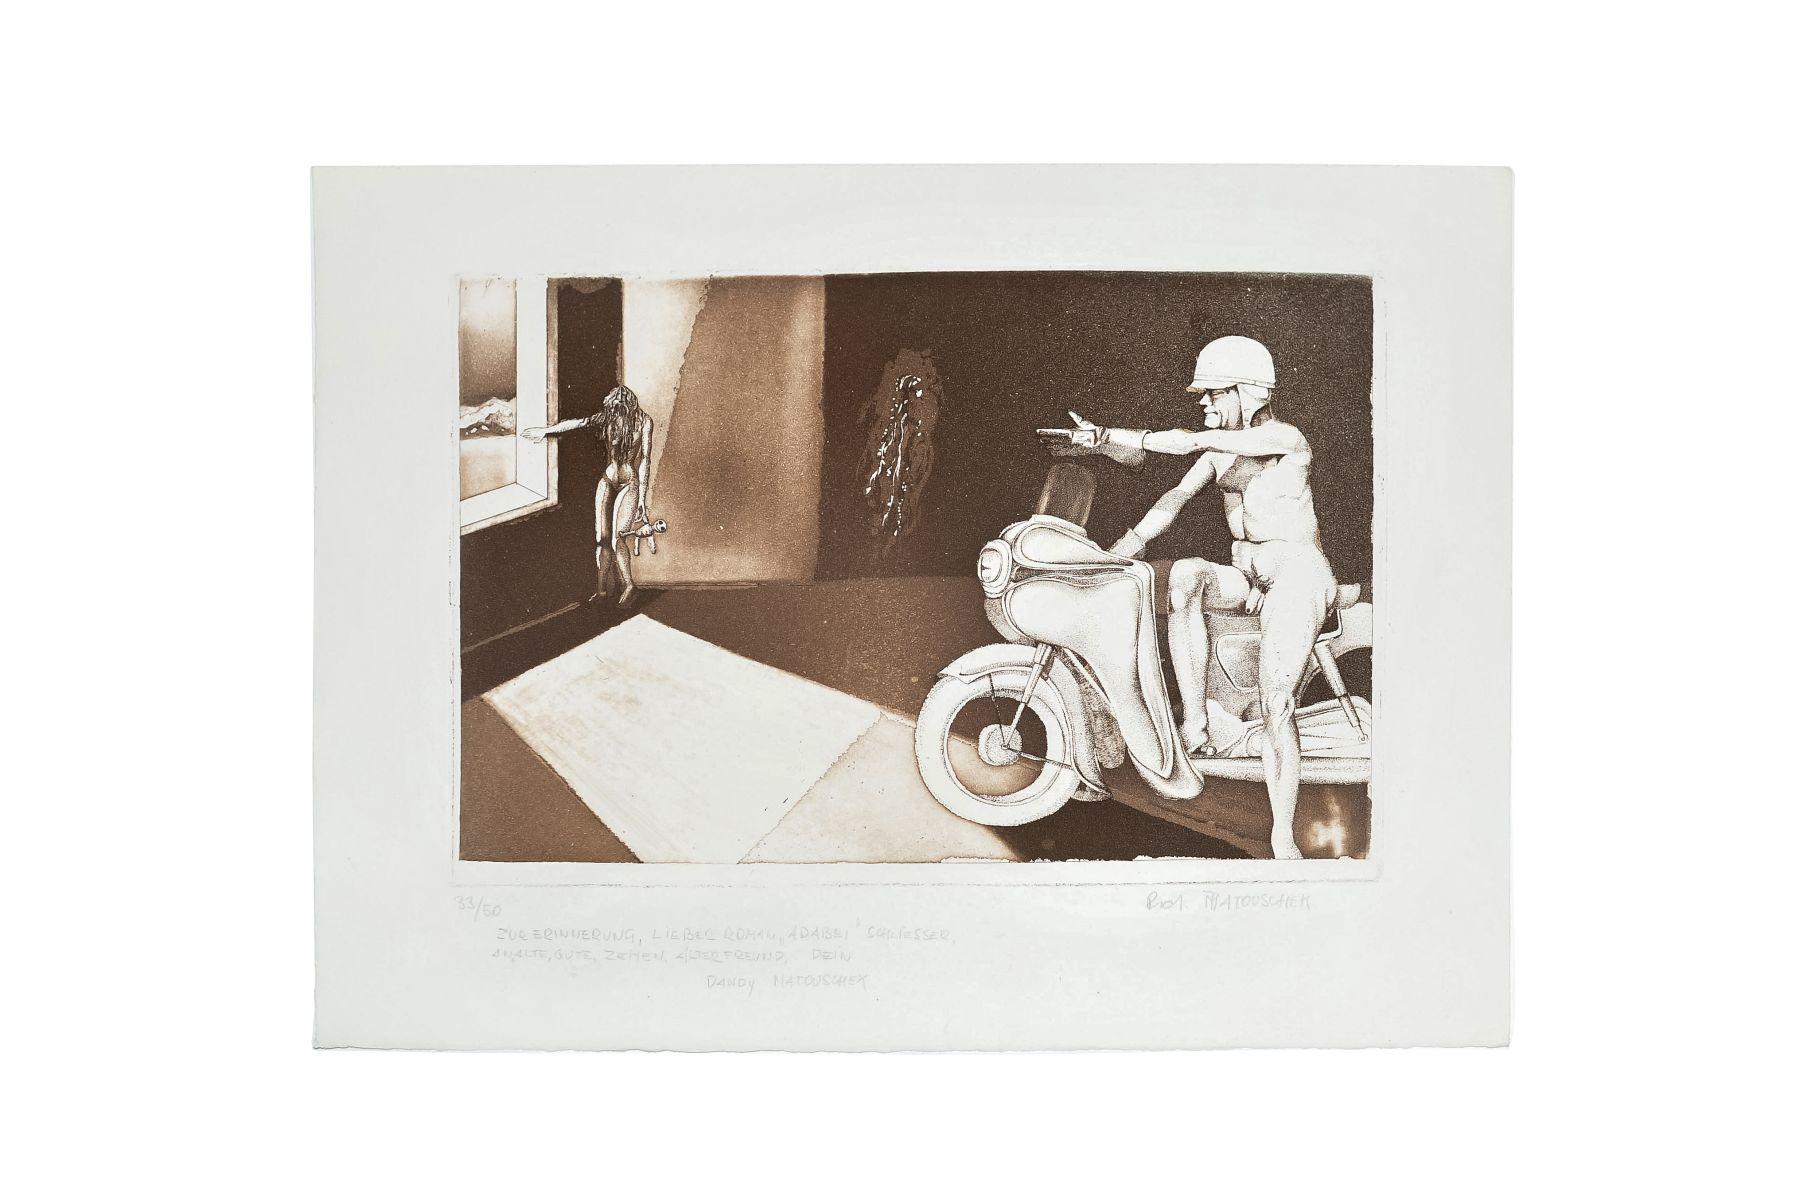 #49 Dandy Matouschek Image